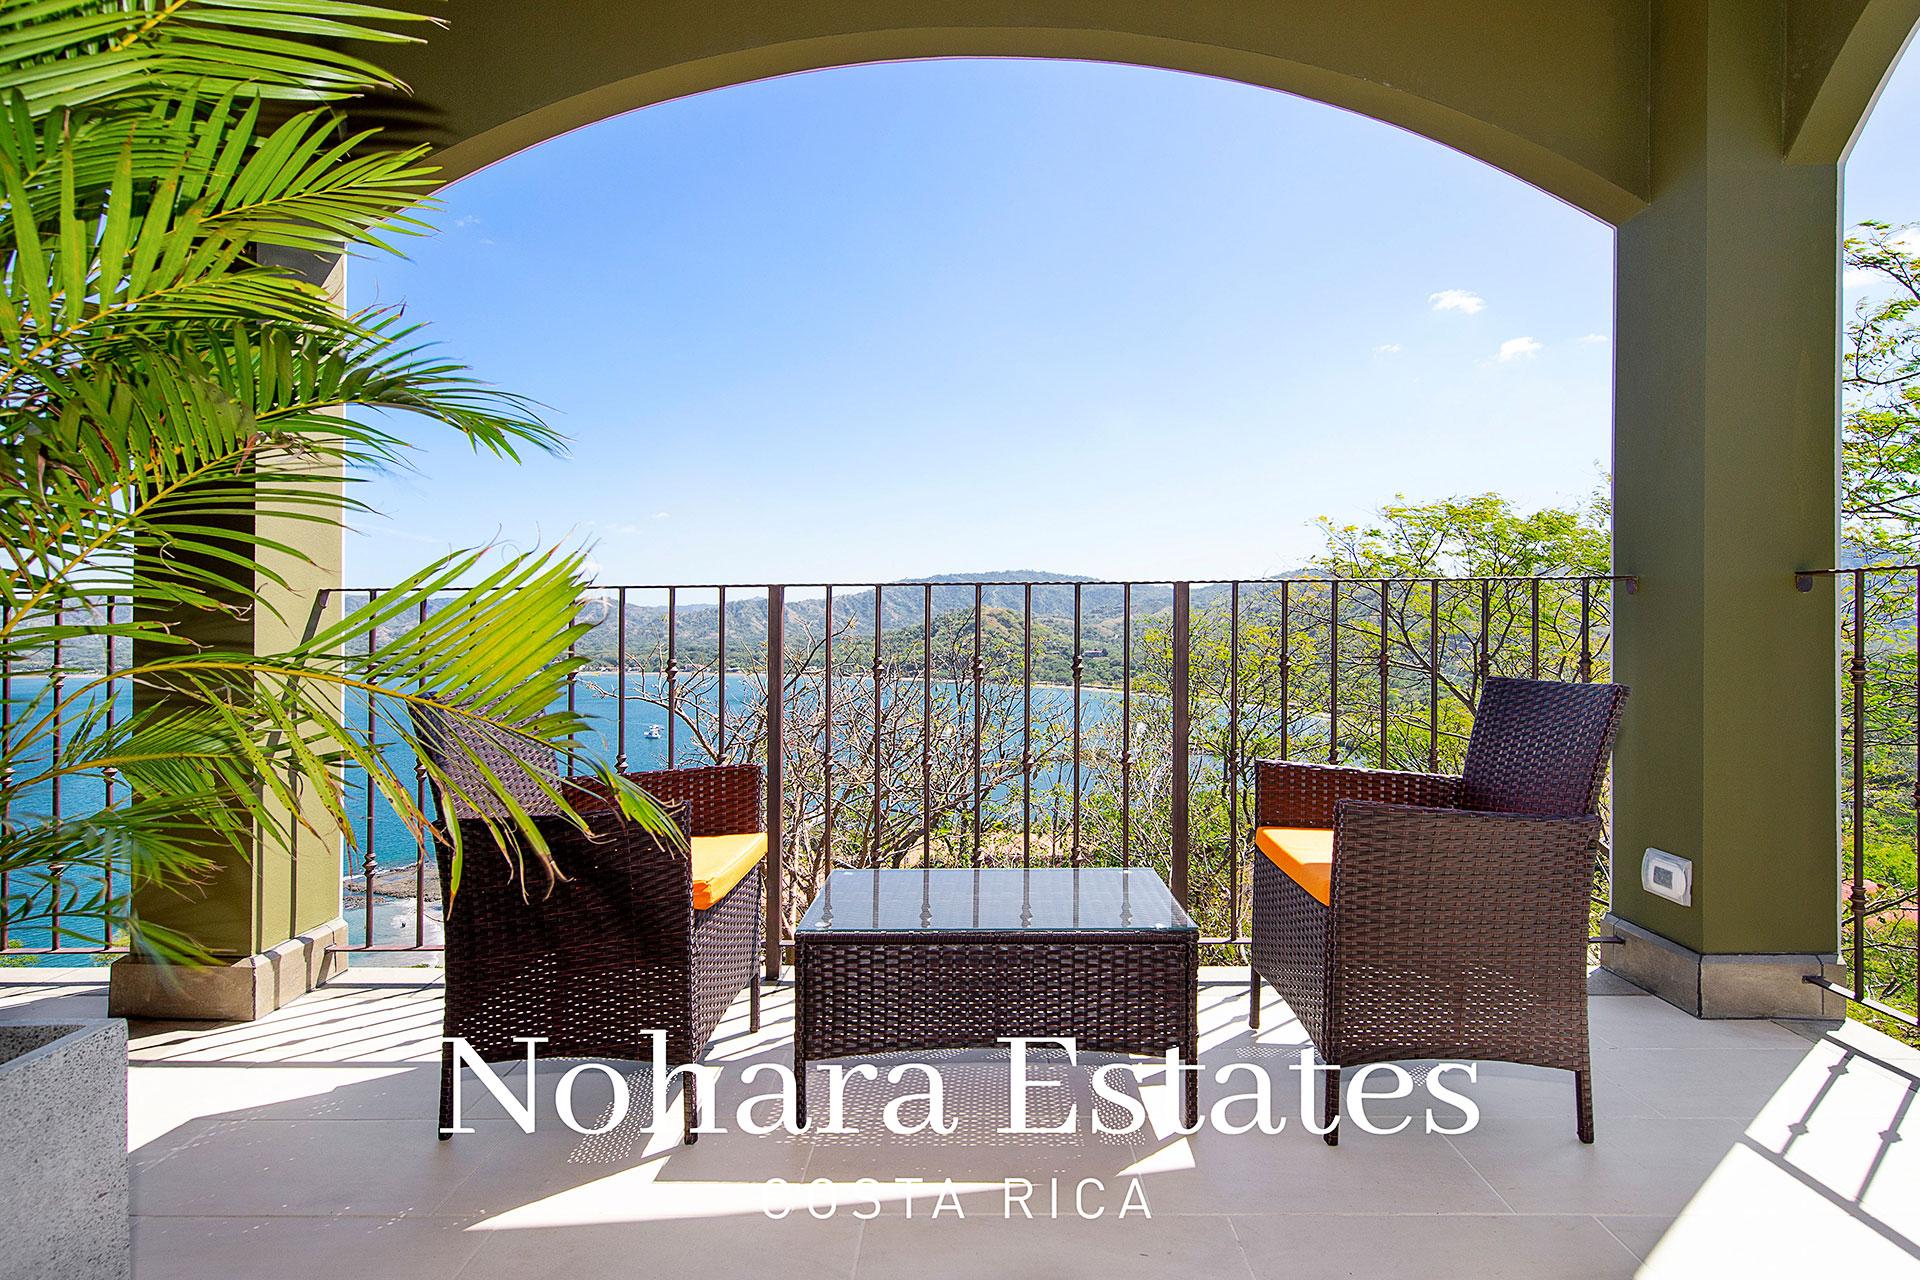 Nohara Estates Costa Rica 360 Esplendor Del Pacifico 101 1